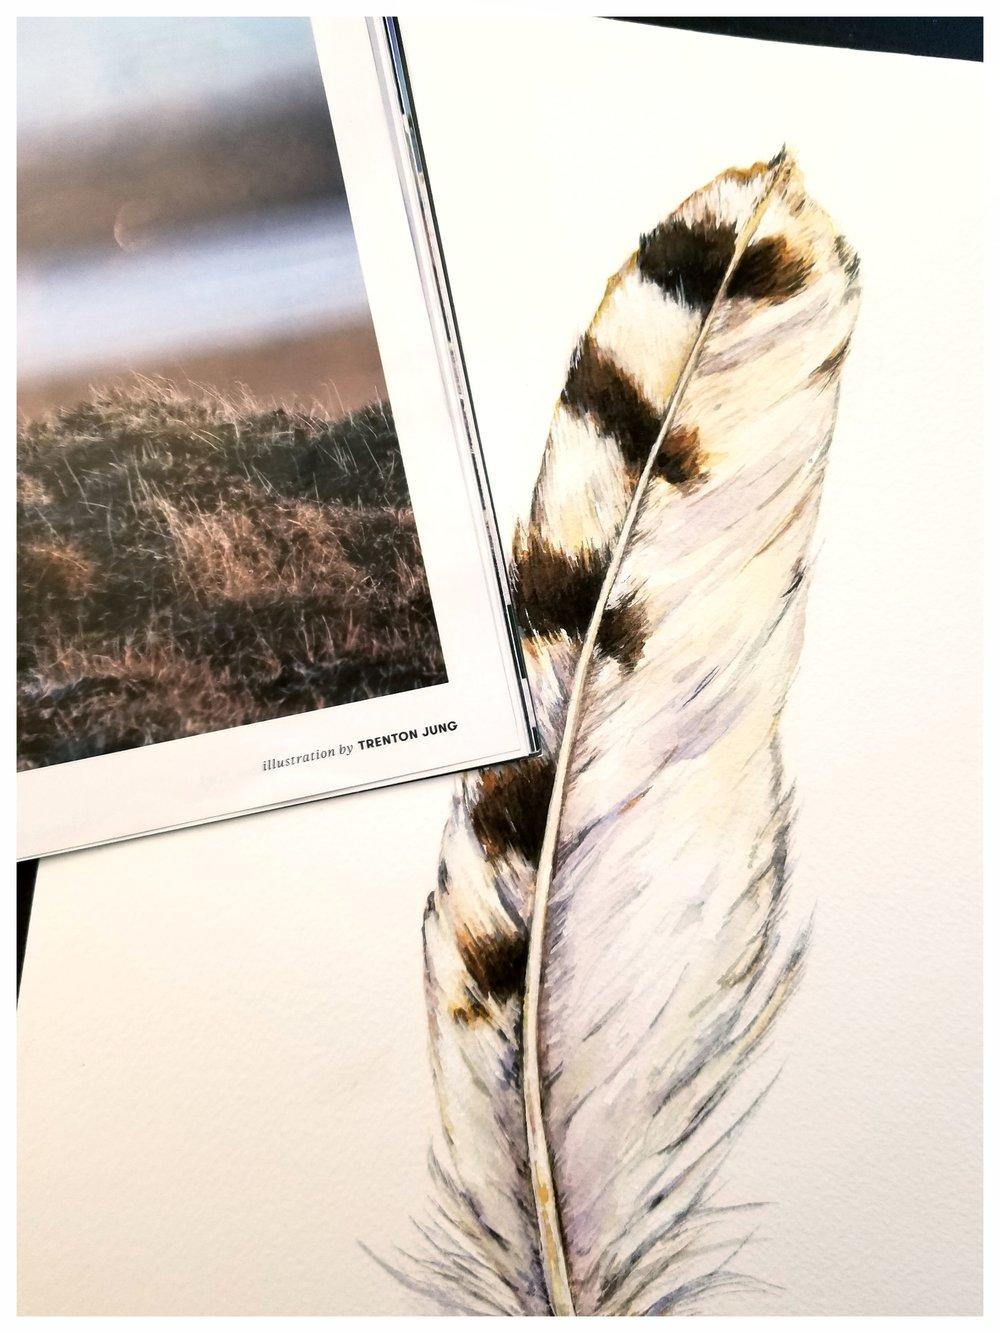 Snowy Owl Feather